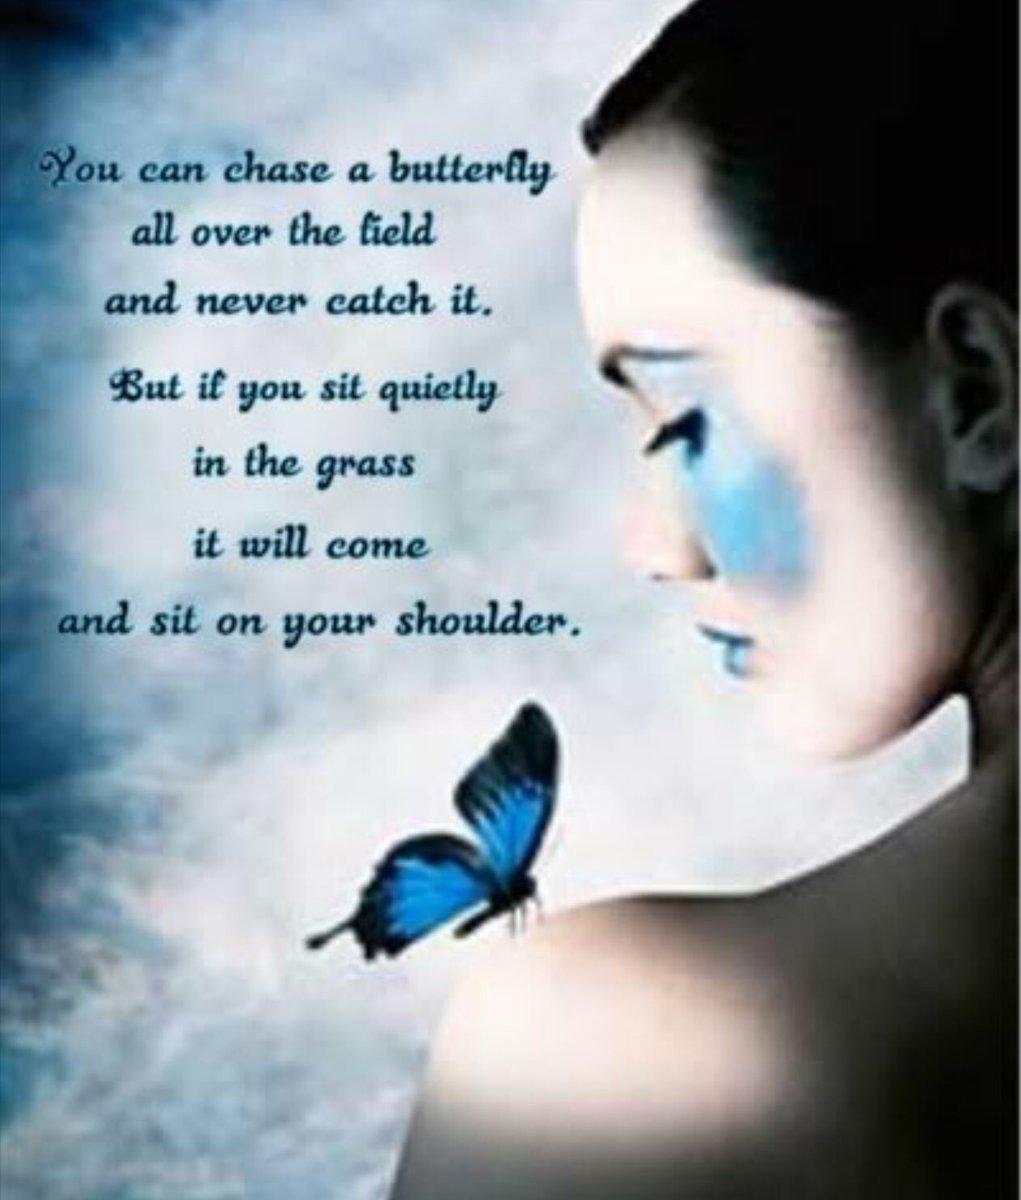 You can  #JoyTrain #defstar5 #MakeYourOwnLane #SmallButPowerful #SoulSaturday #ThinkBIGSundayWithMarsha #MondayMotivation #InspireThemRetweetTuesday #IQRTG #quote #WednesdayWisdom #ThursdayThoughts #butterfly  #butterflies <br>http://pic.twitter.com/Pbpnasqf2D